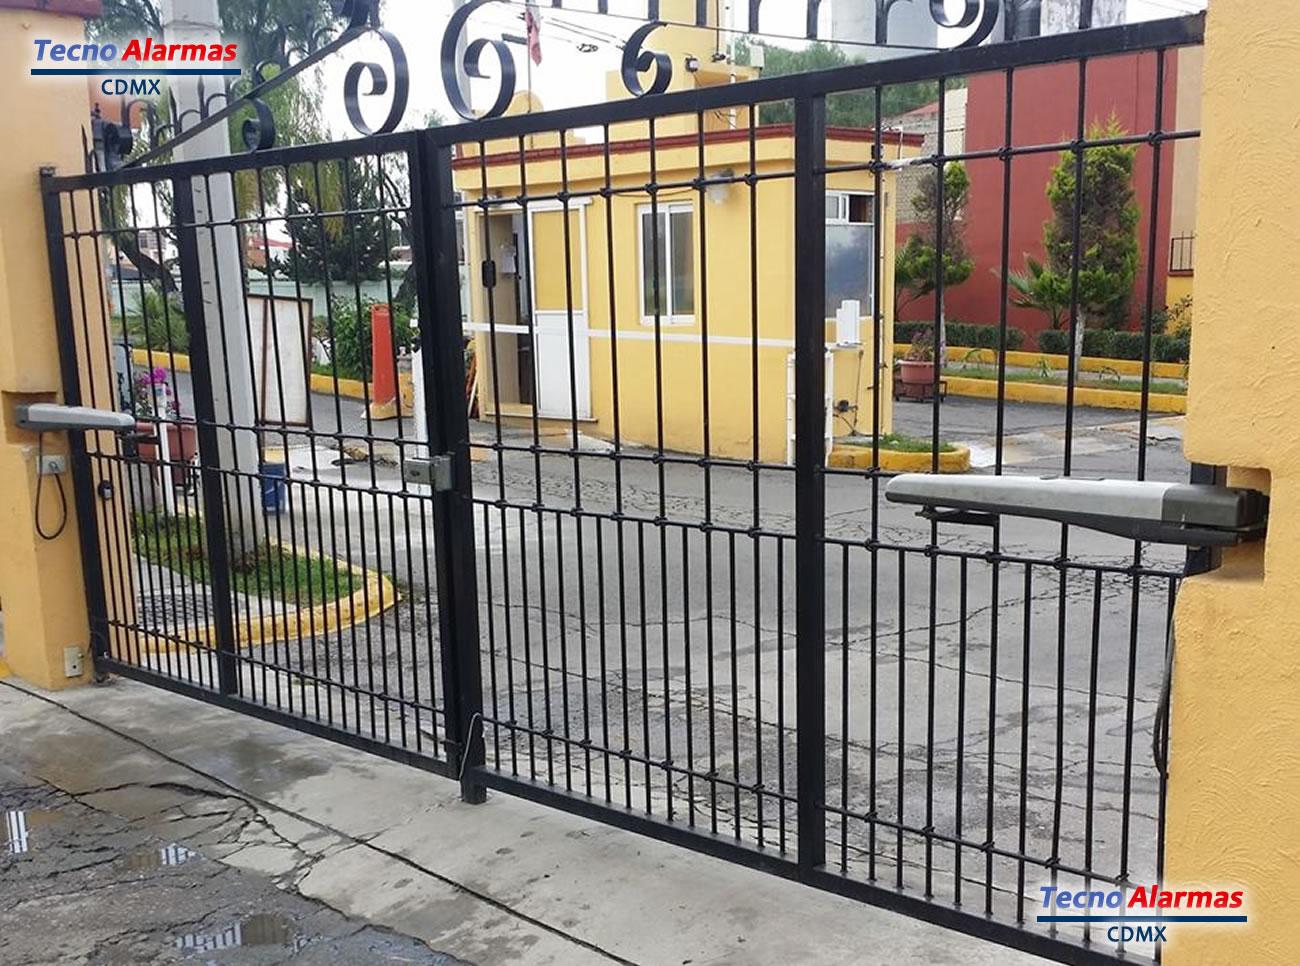 Puertas autom ticas para garaje o cochera automatizaci n - Automatizacion de puertas ...